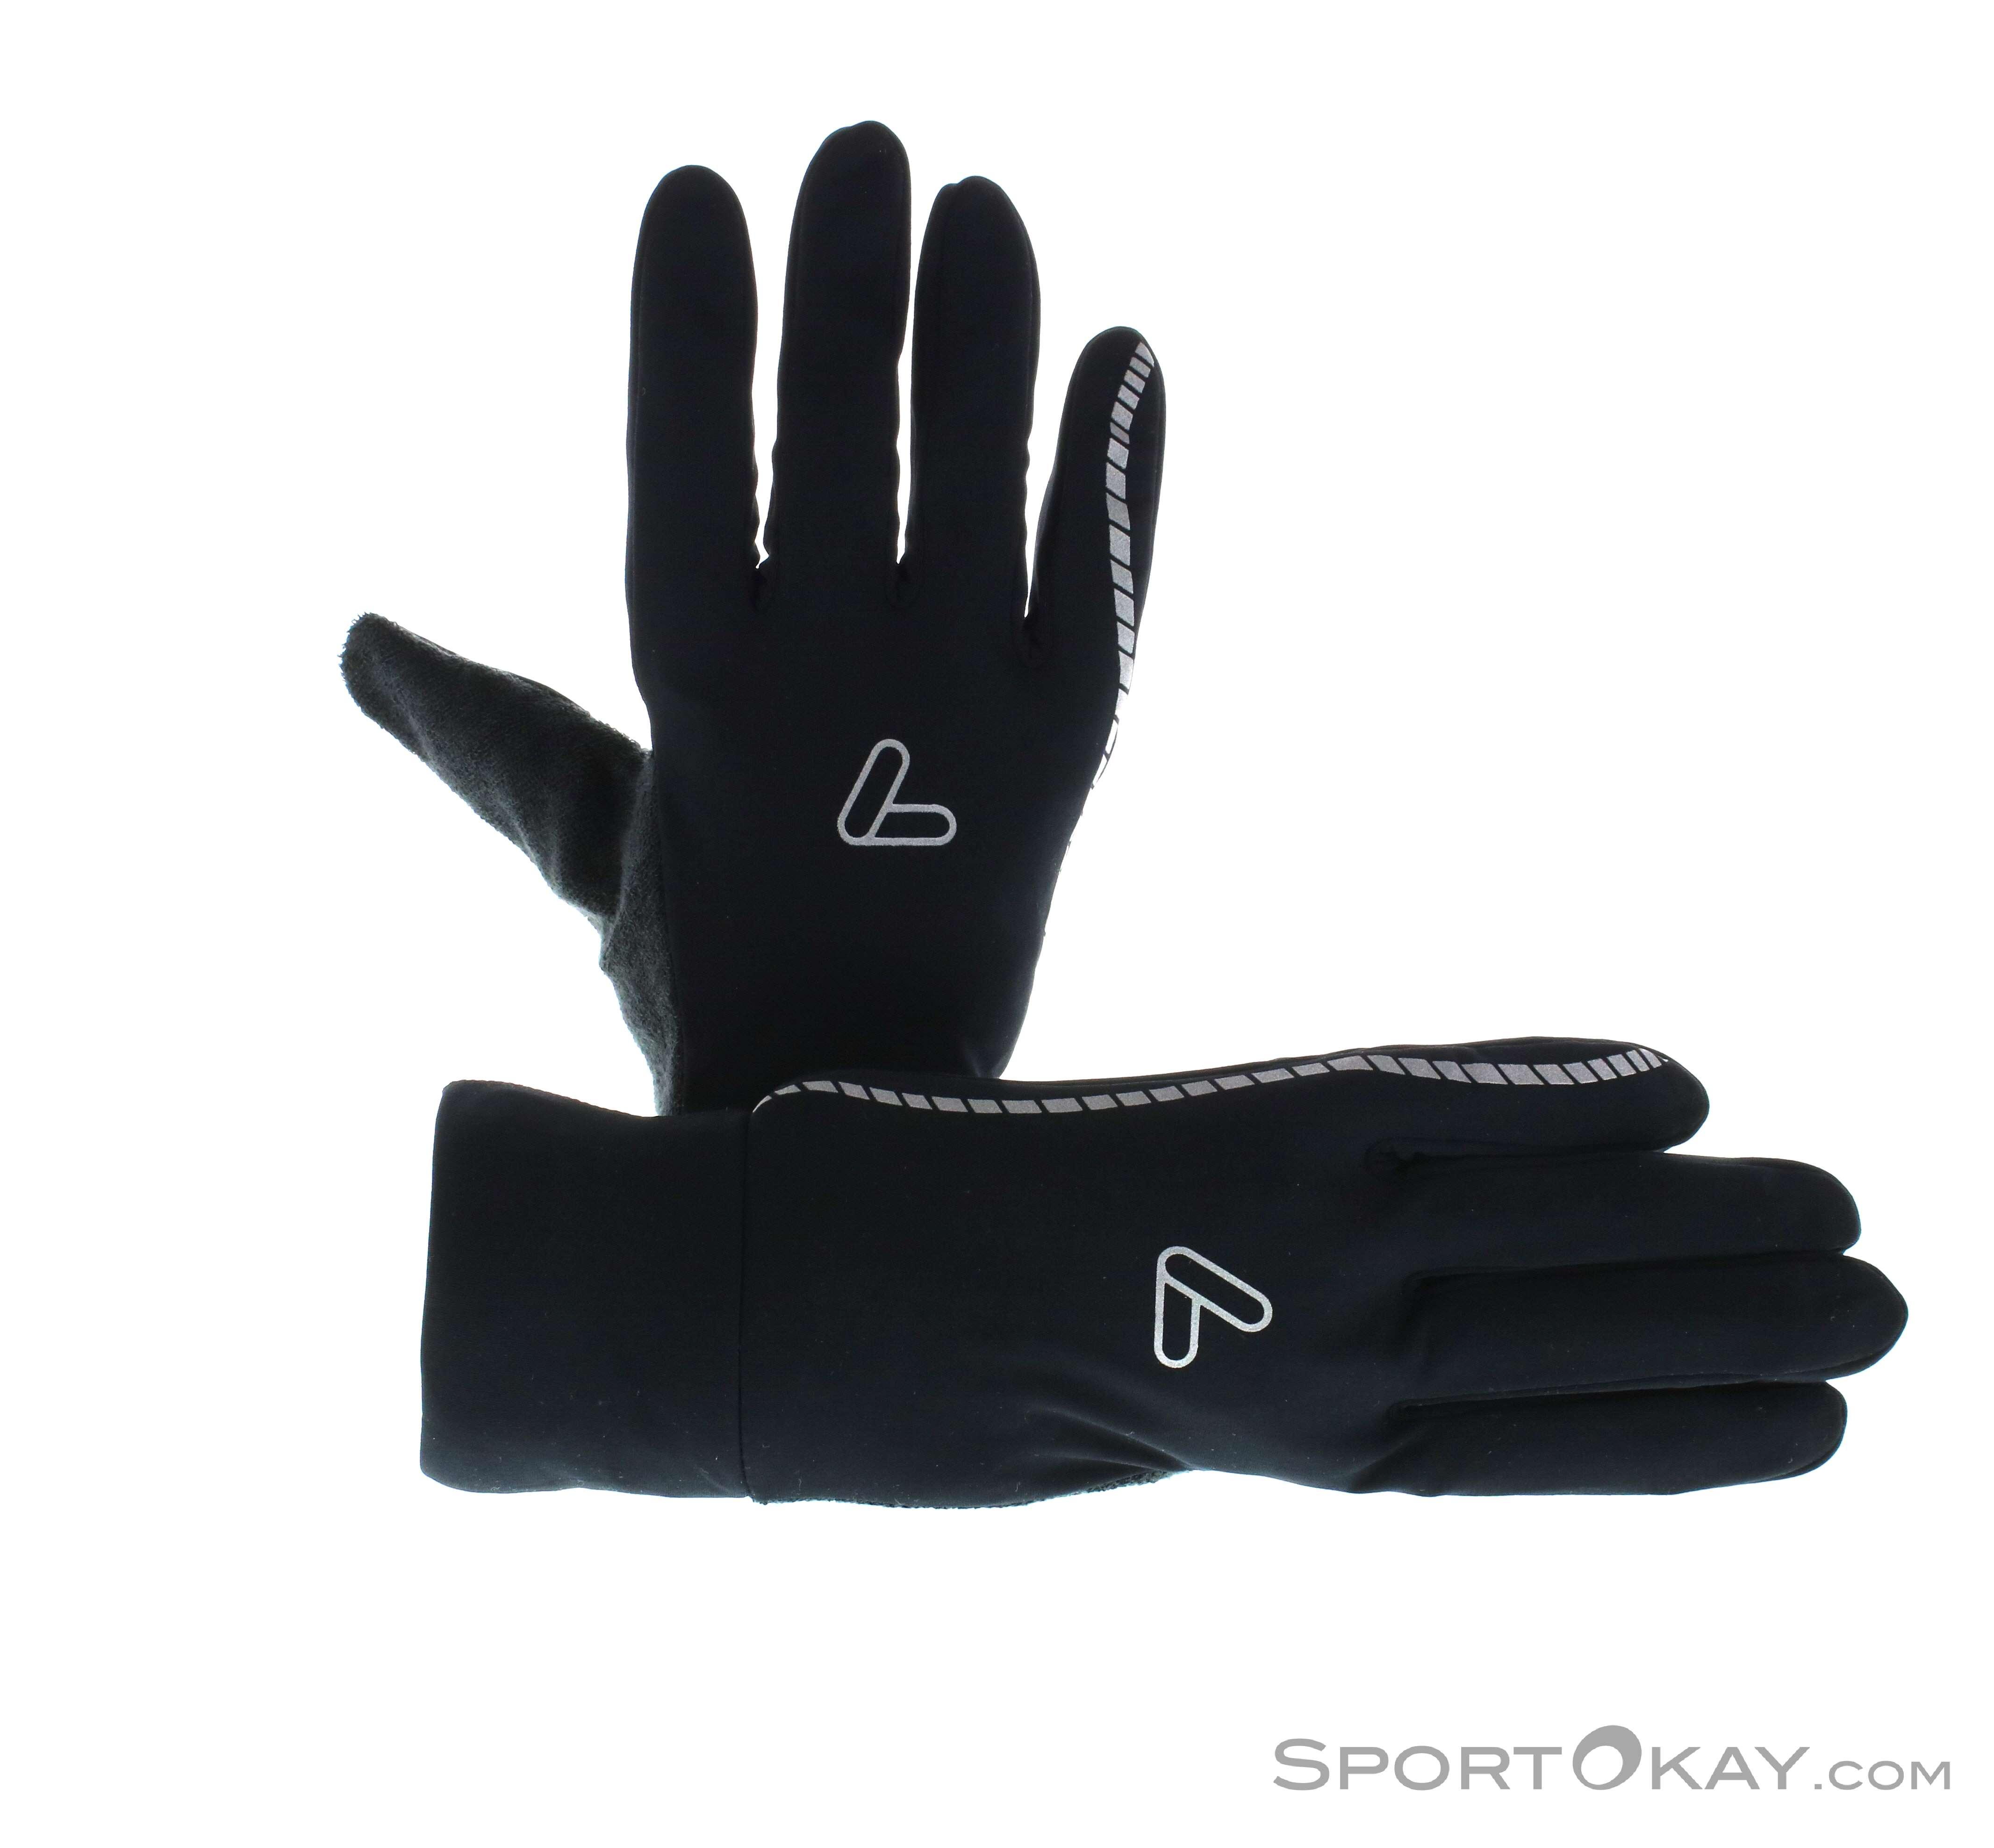 Löffler Thermo Innenvelours Handschuhe, Löffler, Schwarz, , Herren, 0008-10498, 5637569503, 9008805627904, N1-01.jpg